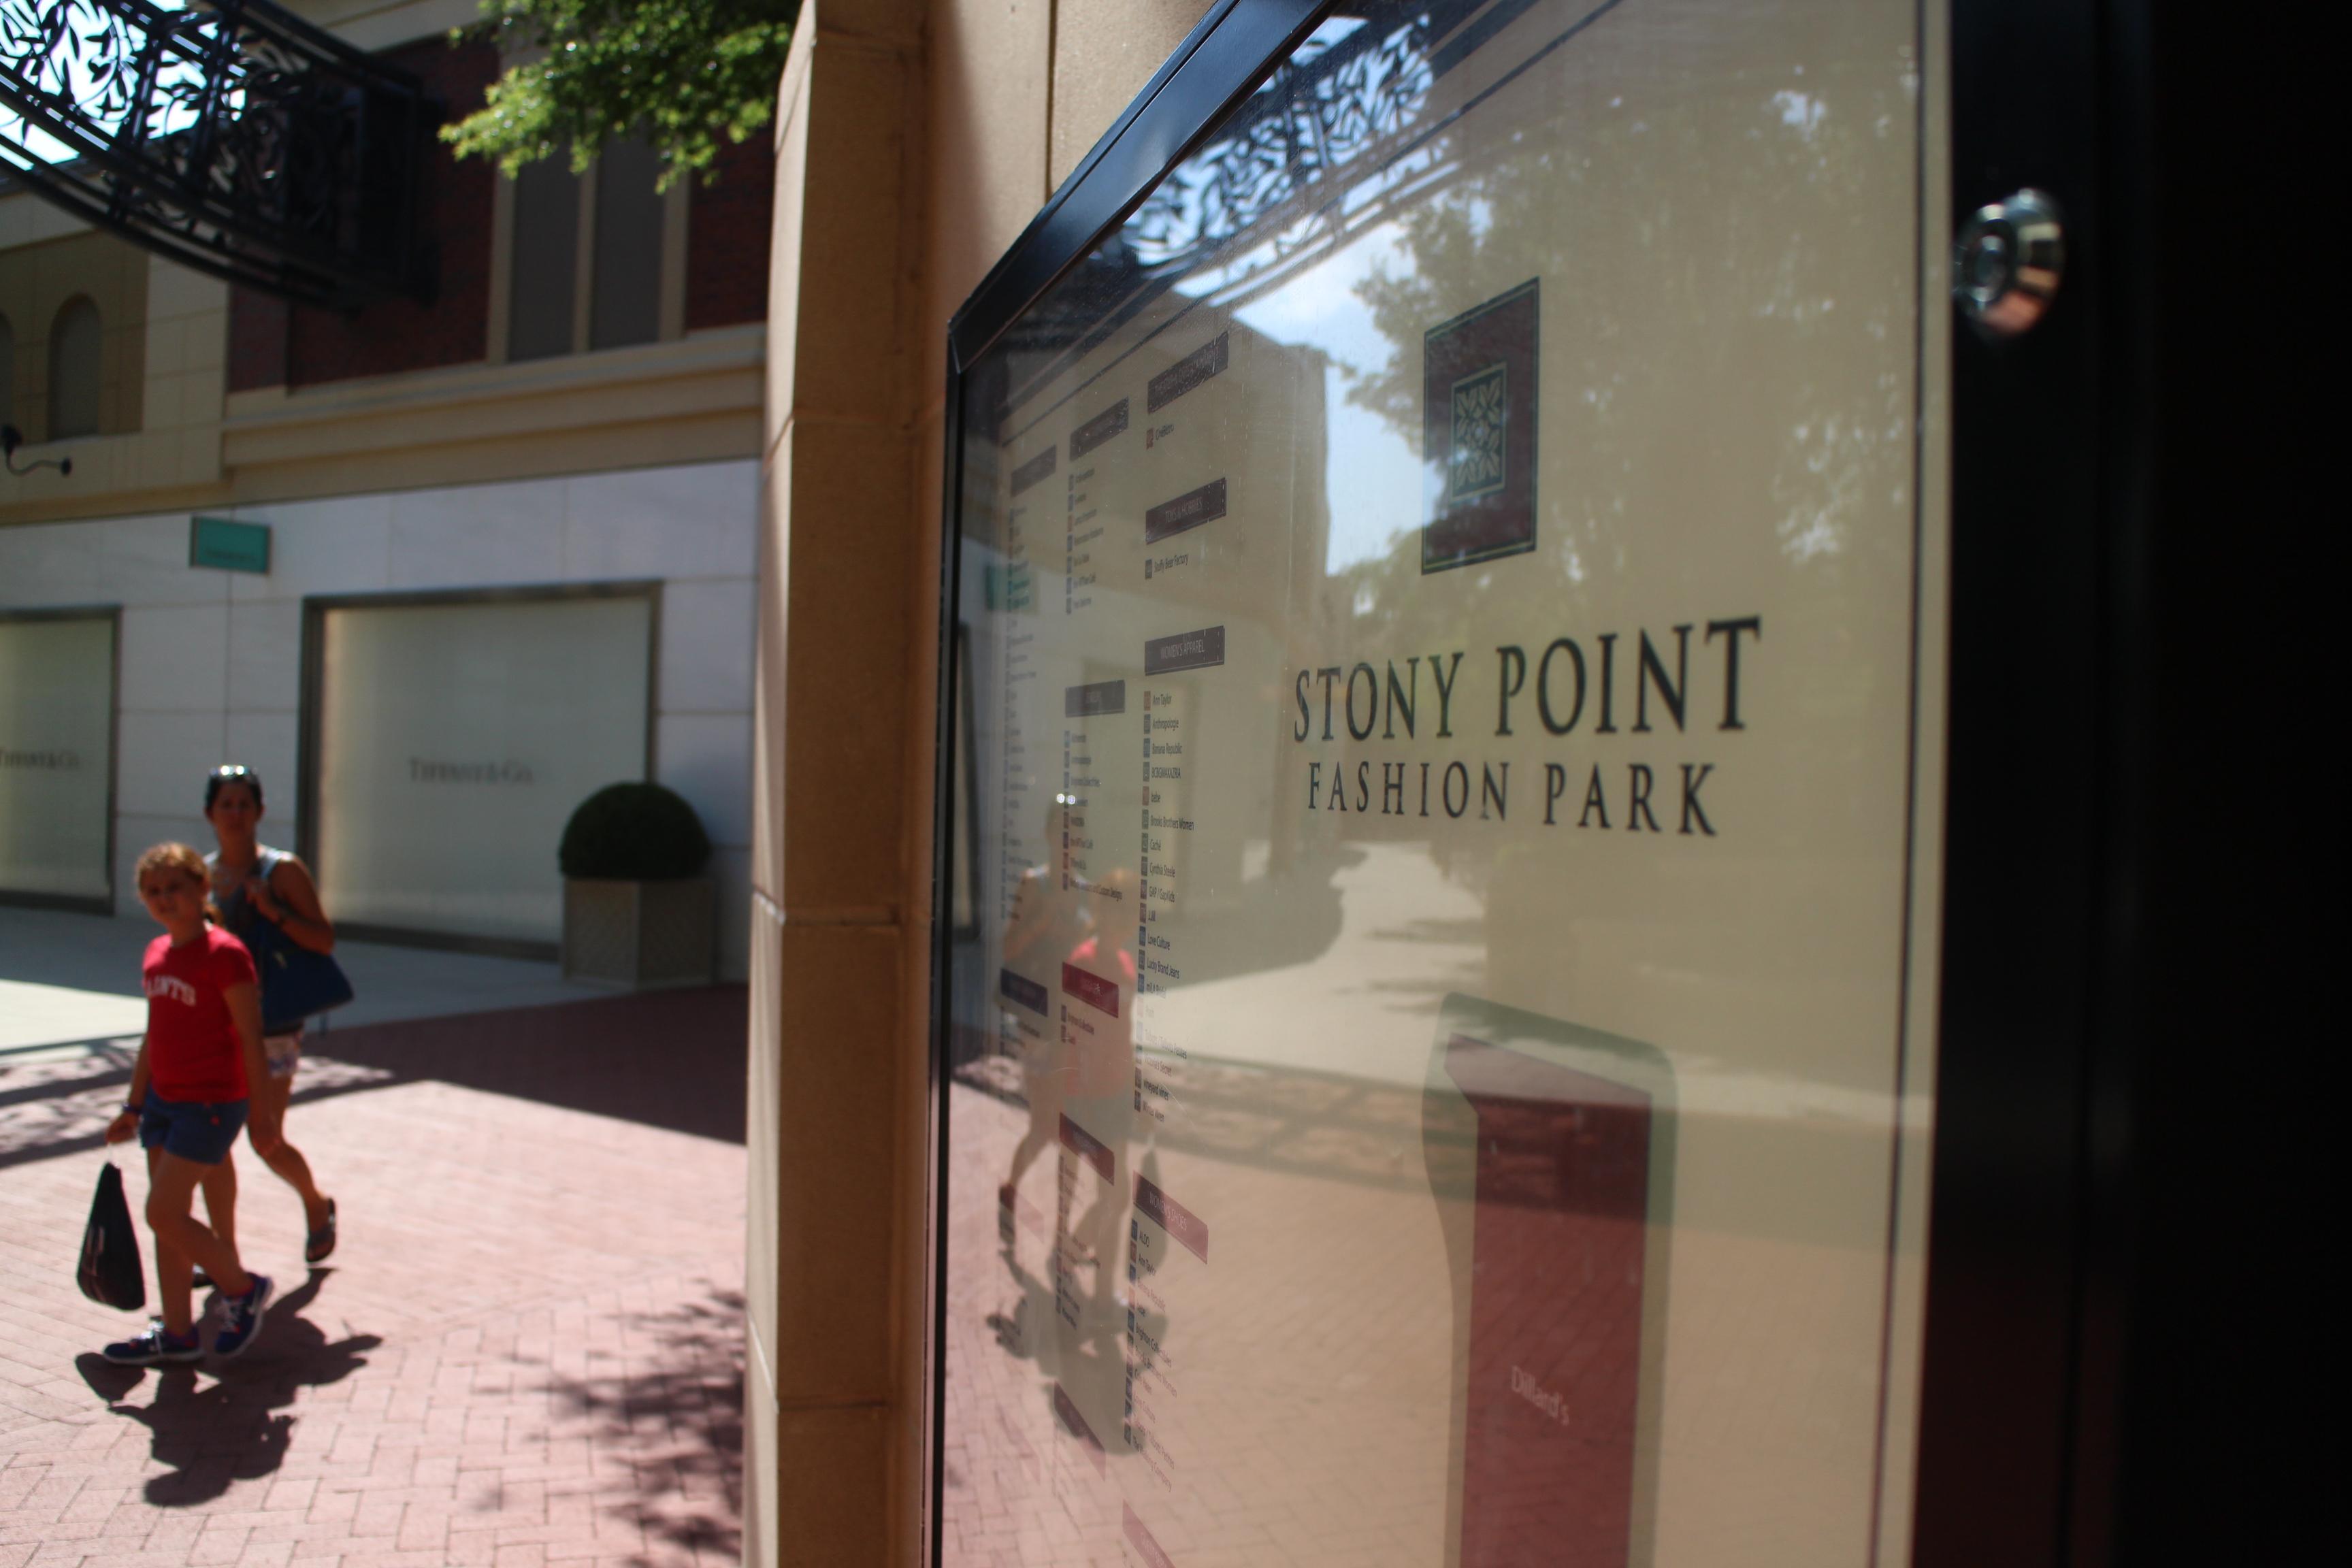 CinBistro CinBistro at Stony Point Fashion Park 38